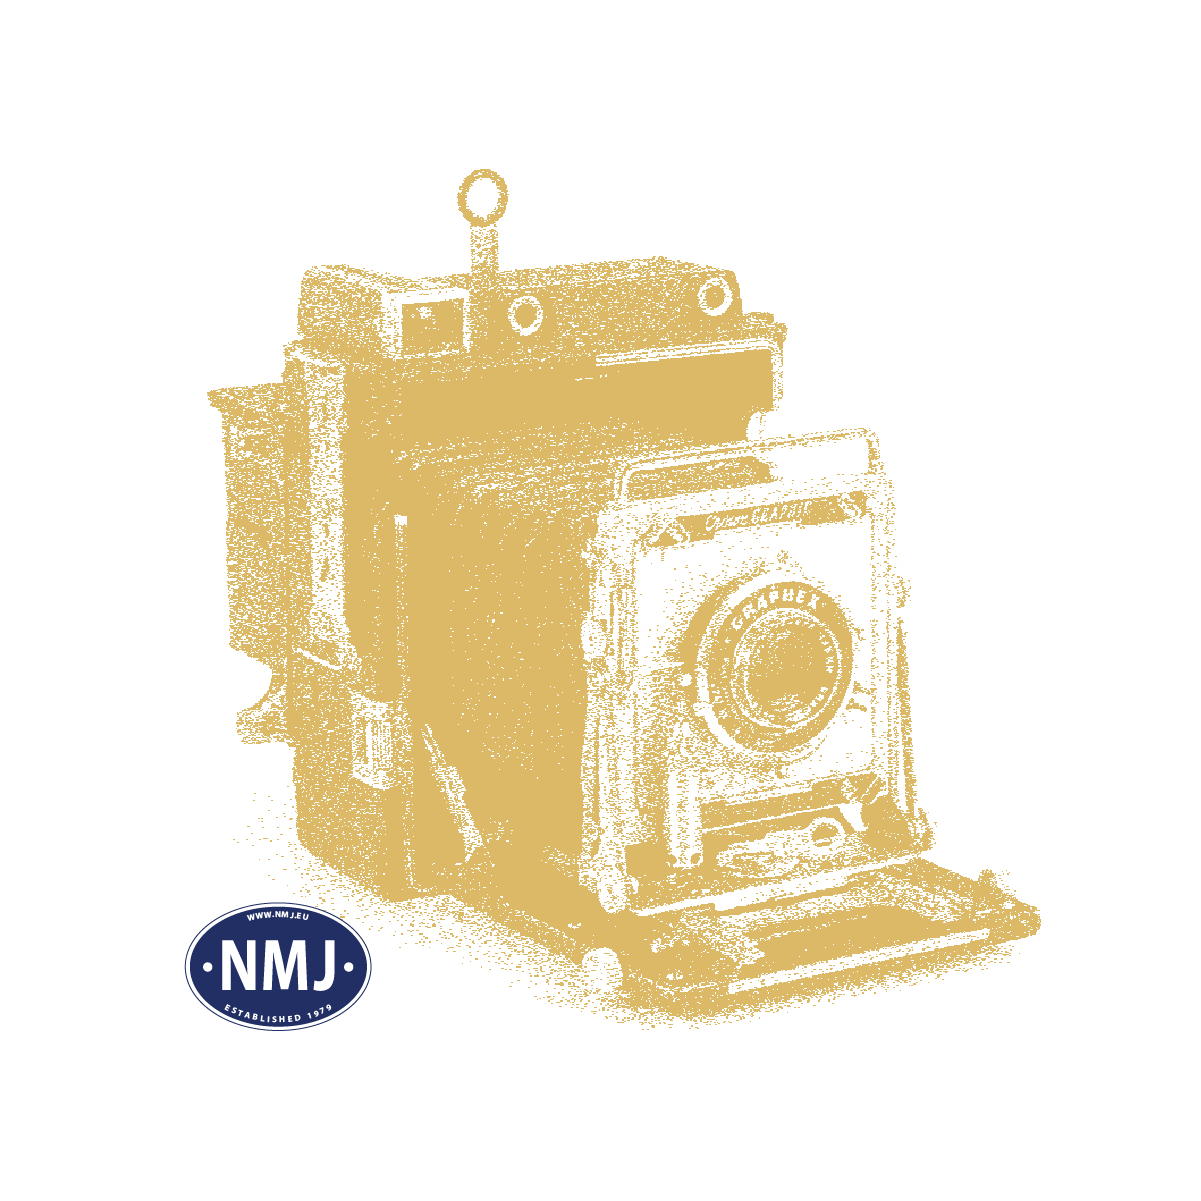 NMJT90302 - NMJ Topline CFL 1603 (1956-1971), DCC Sound